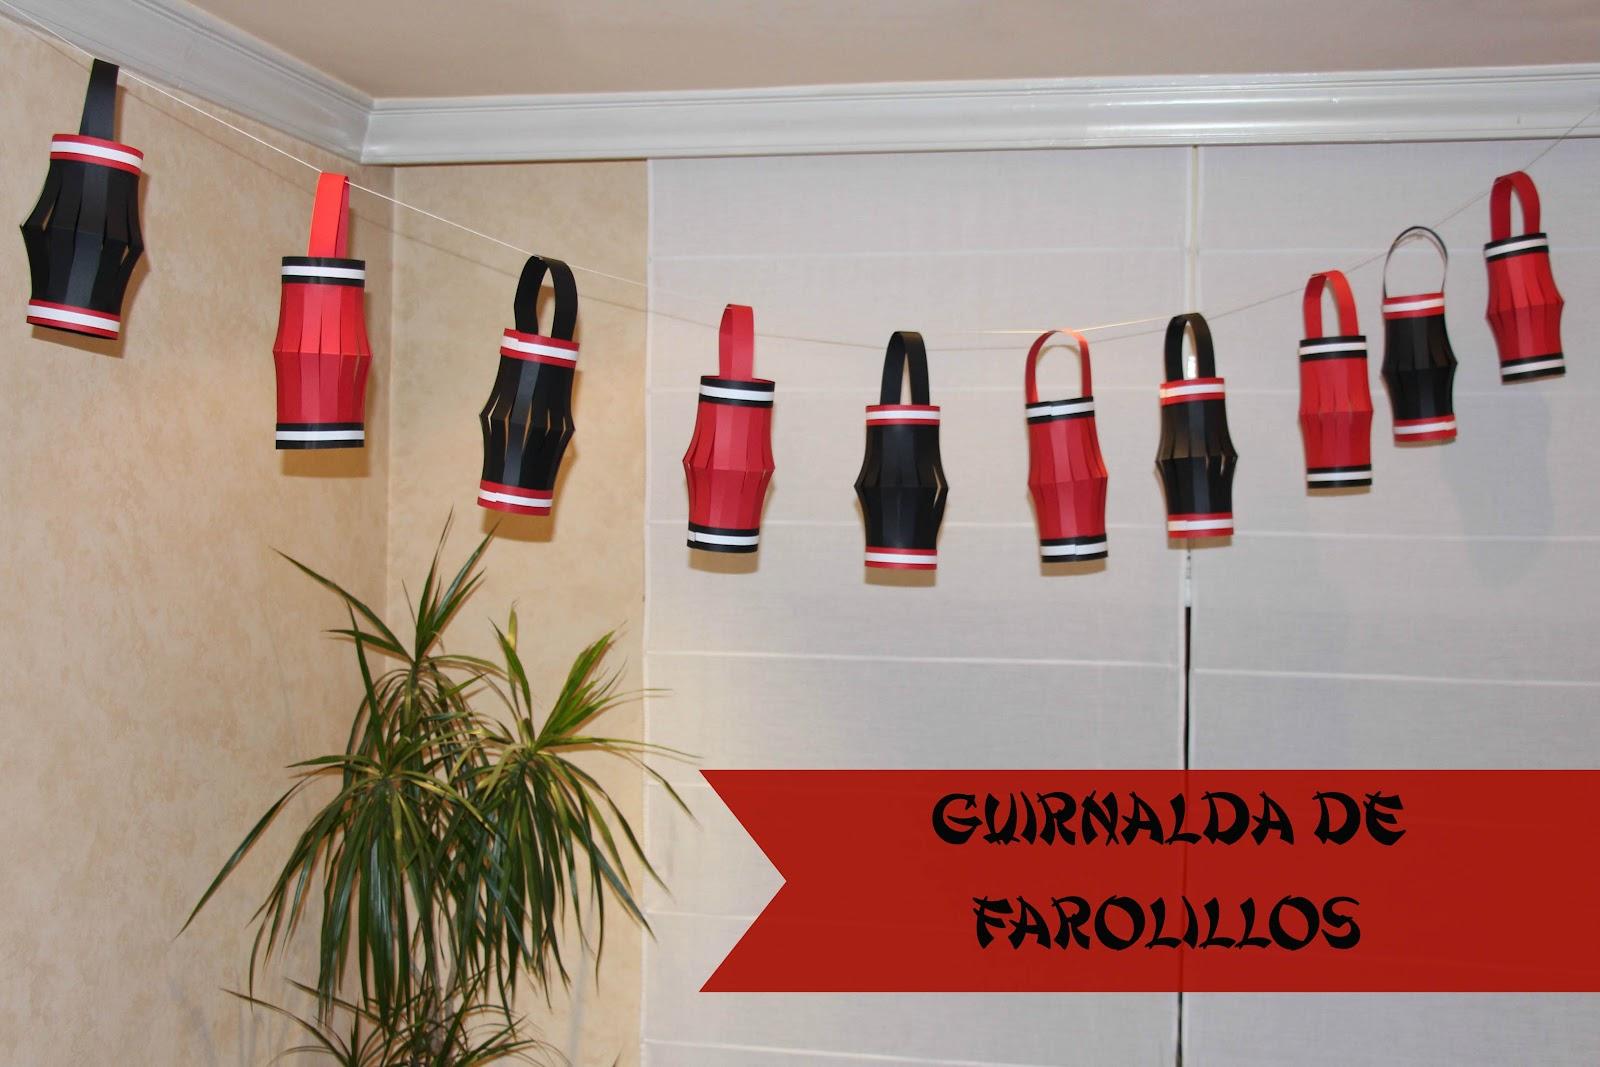 Mardefiesta farolillos de papel for Farolillos de decoracion